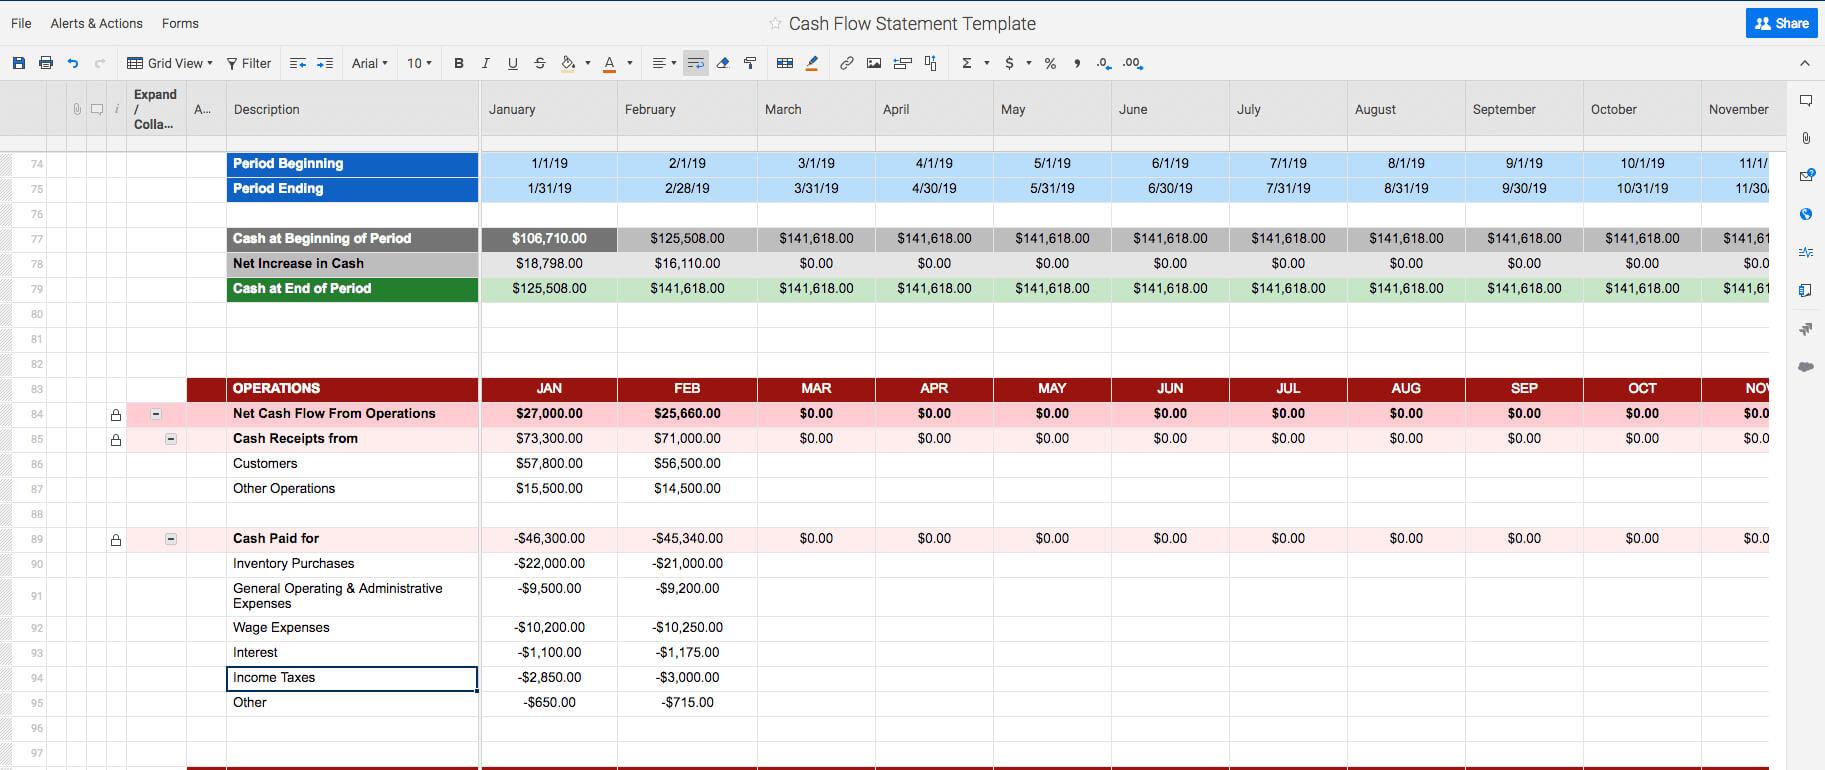 Free Cash Flow Statement Templates | Smartsheet Inside Cash Position Report Template